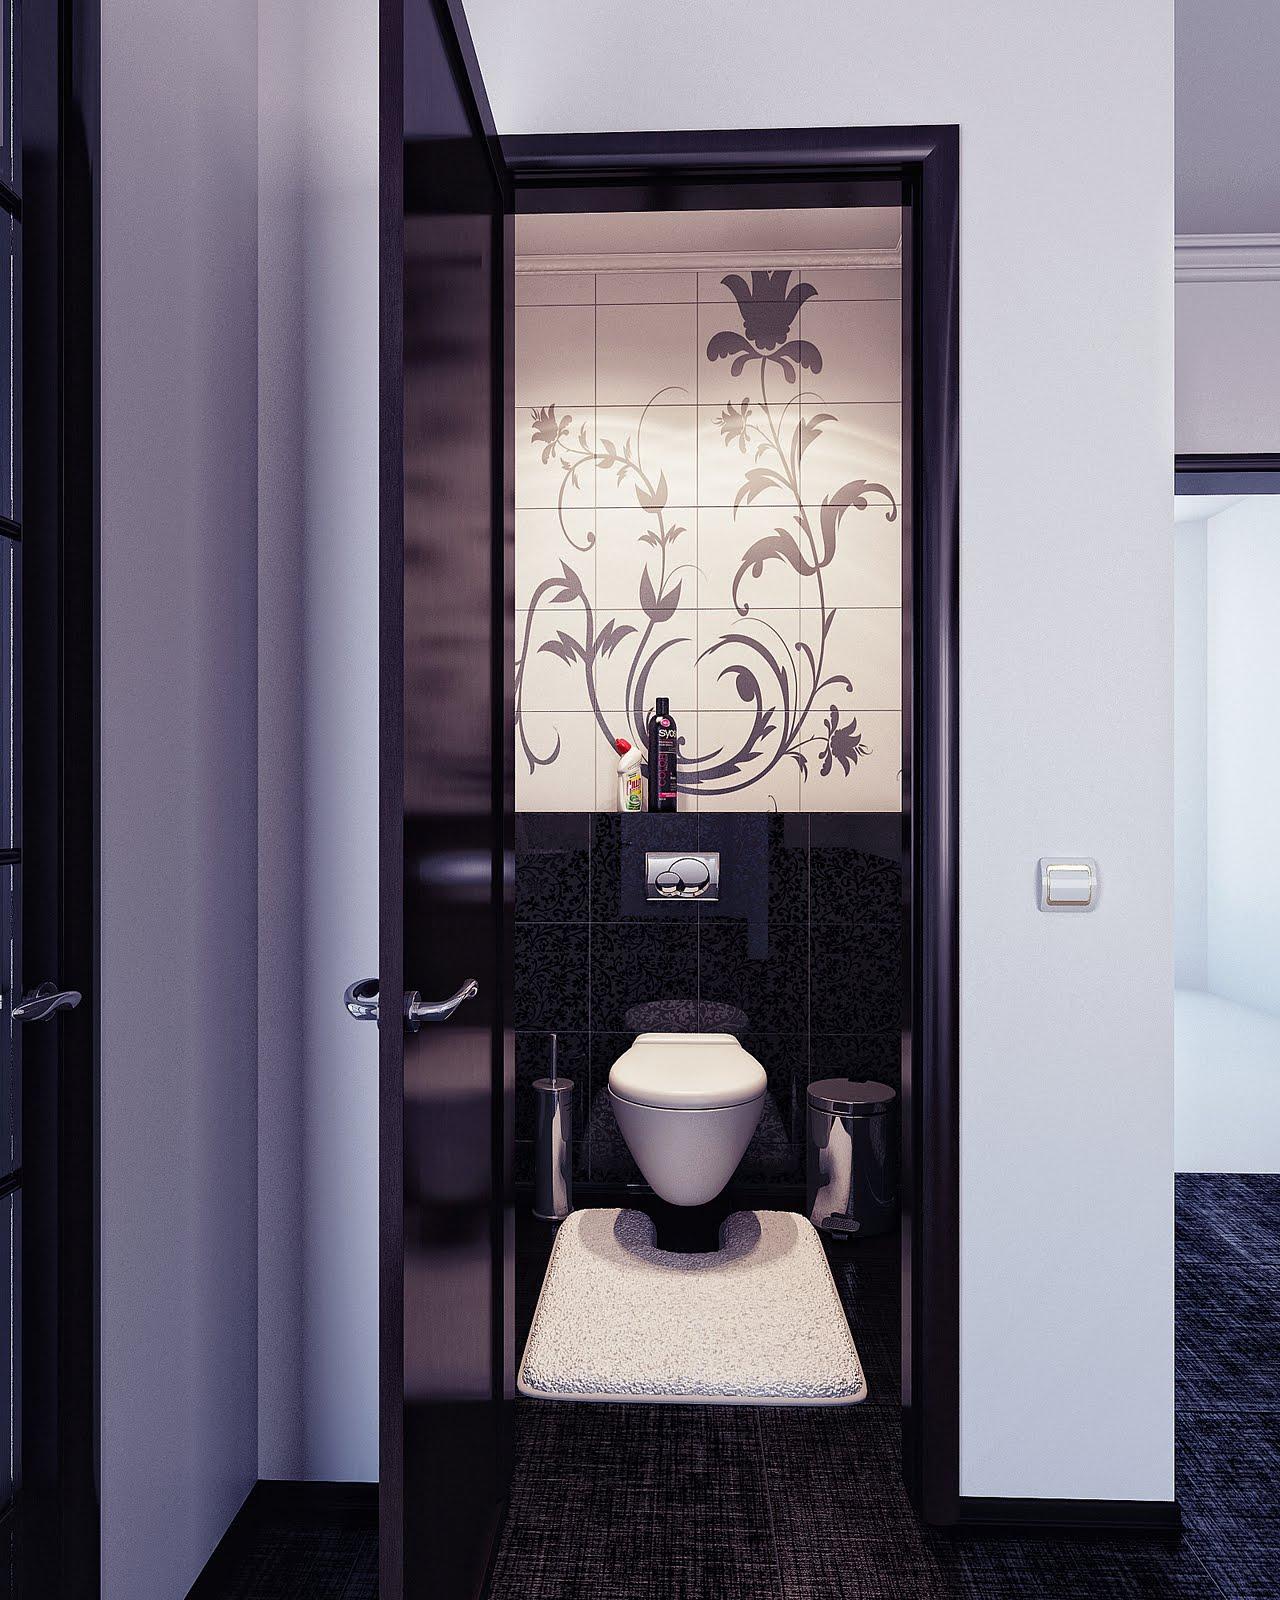 Bathroom Elegant Black White Bathroom Interior With: Black And White Modern Elegant Bathroom